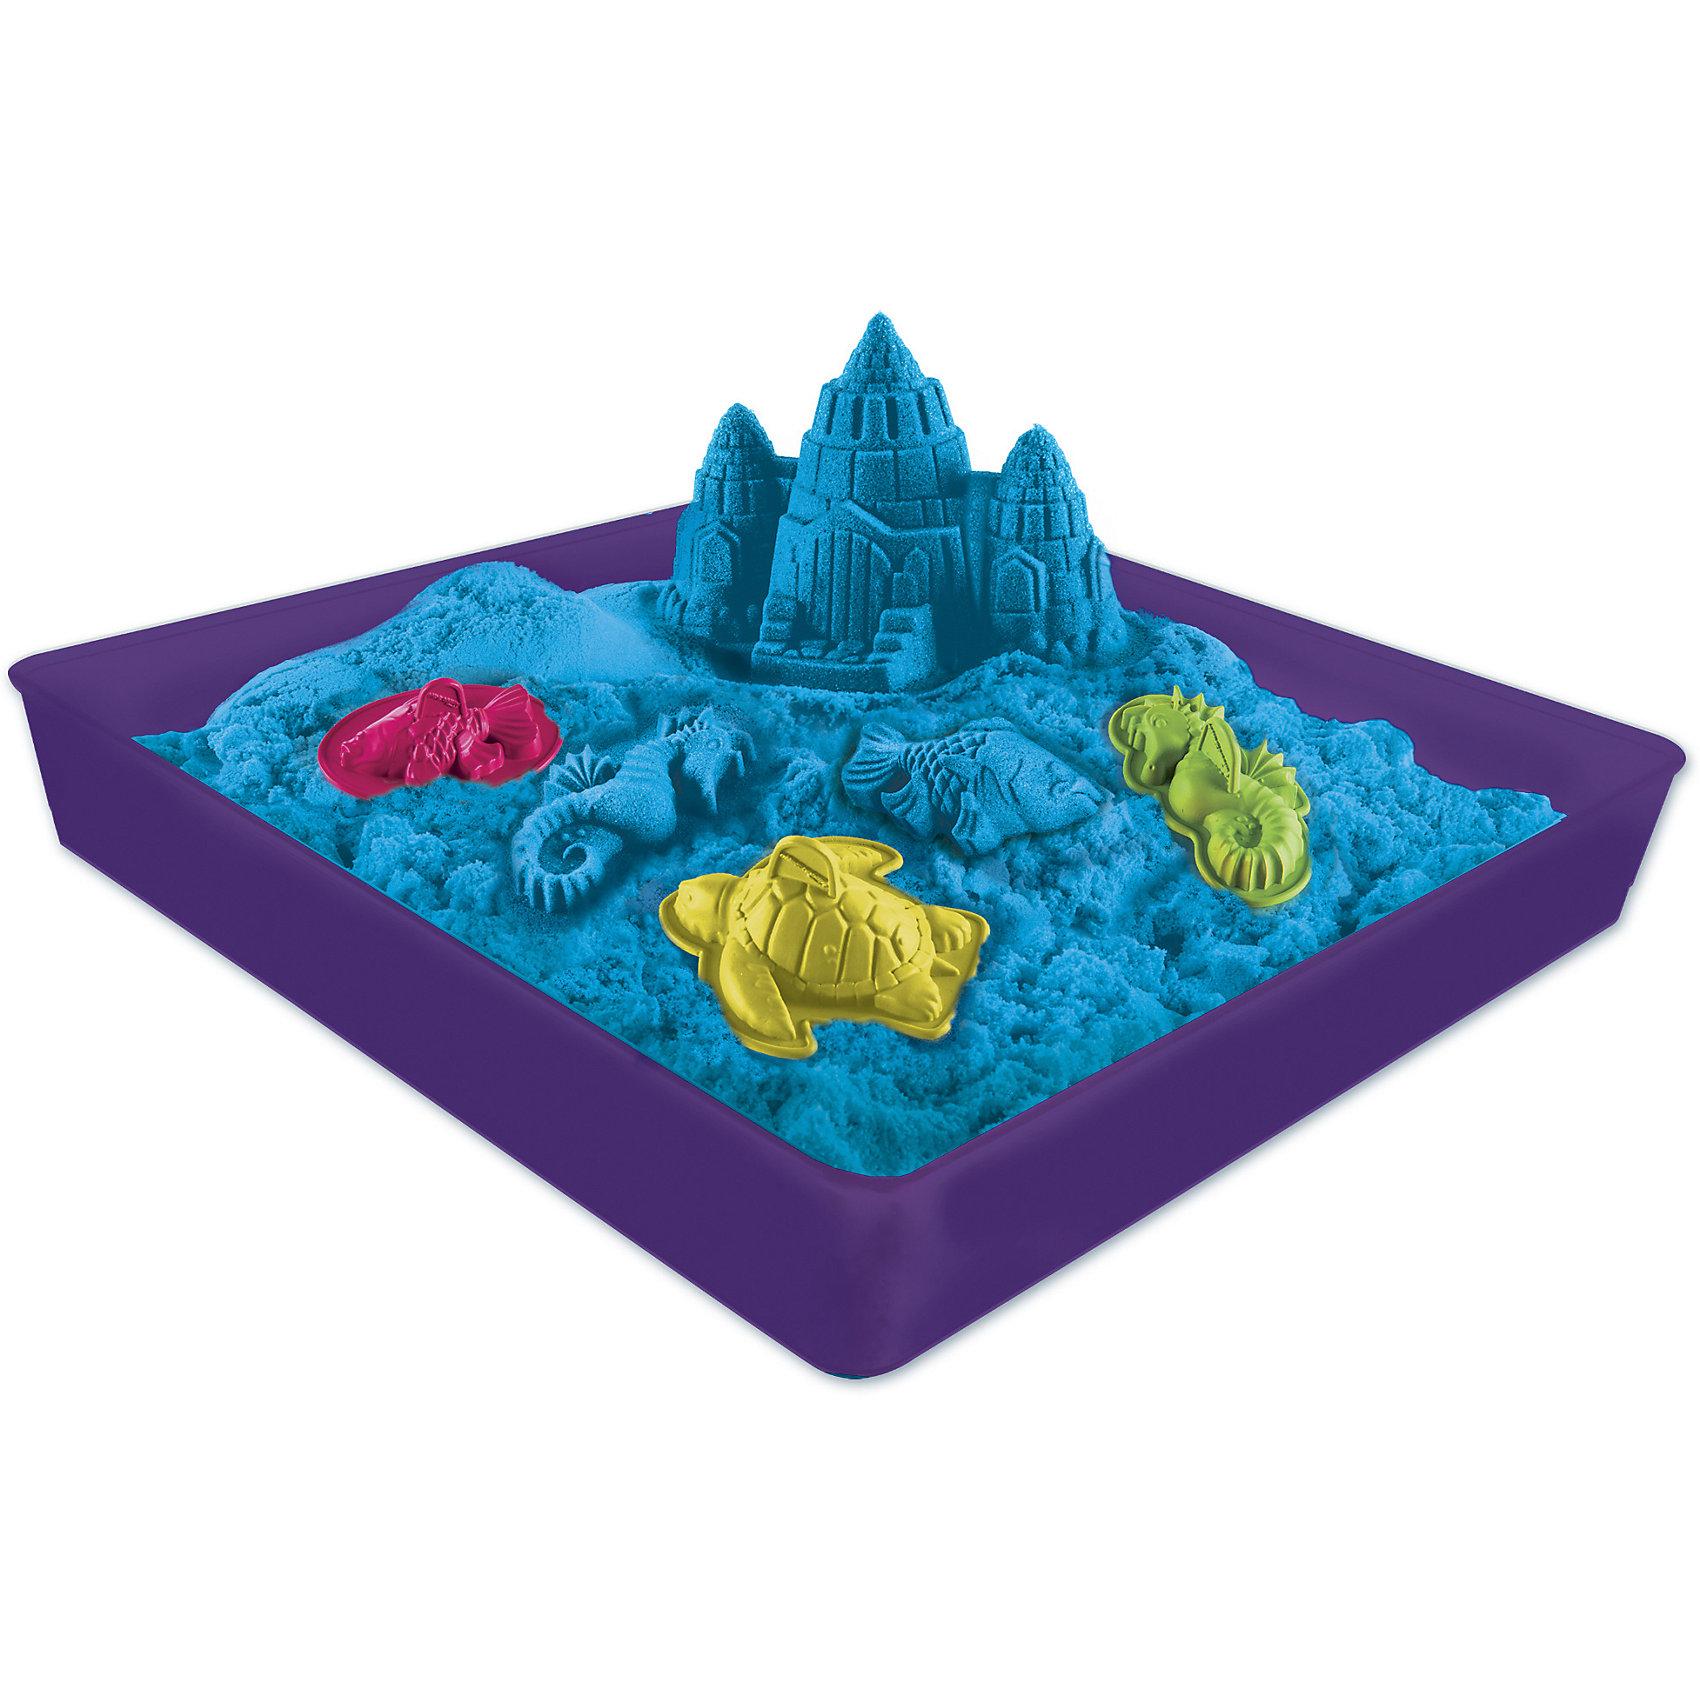 ����� ��� ����� Kinetic sand, 454 ��, �����, 4 ��������, �������